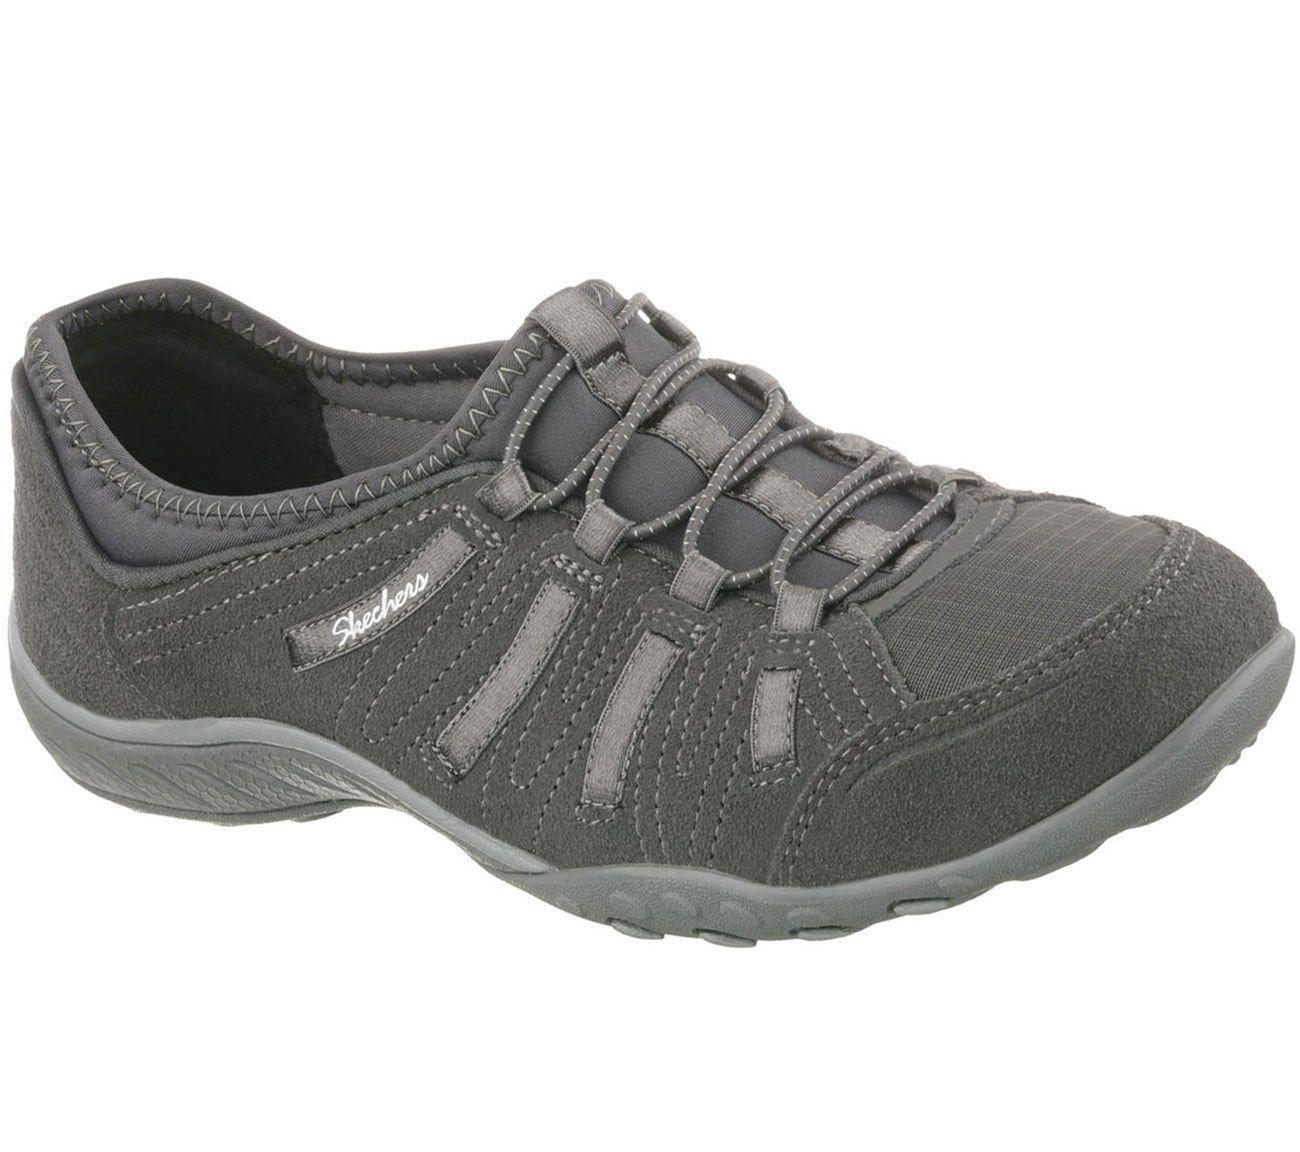 217bcbcc26ca 22478 Charcoal Skechers Shoe Memory Foam Women Comfort Casual Slip On Suede  Mesh